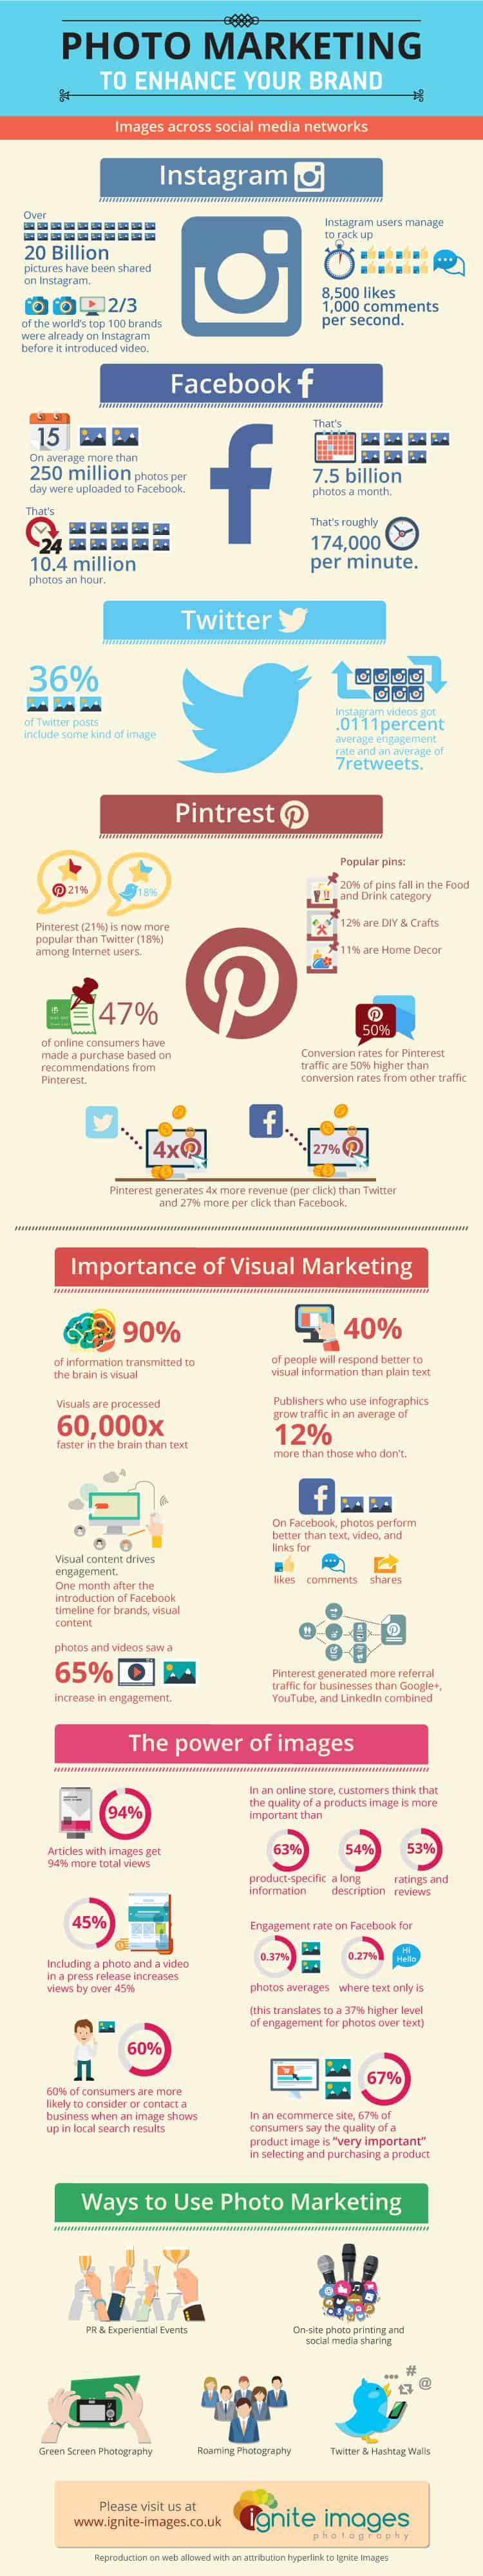 Ignite-Images-Infographic-Photo Marketing